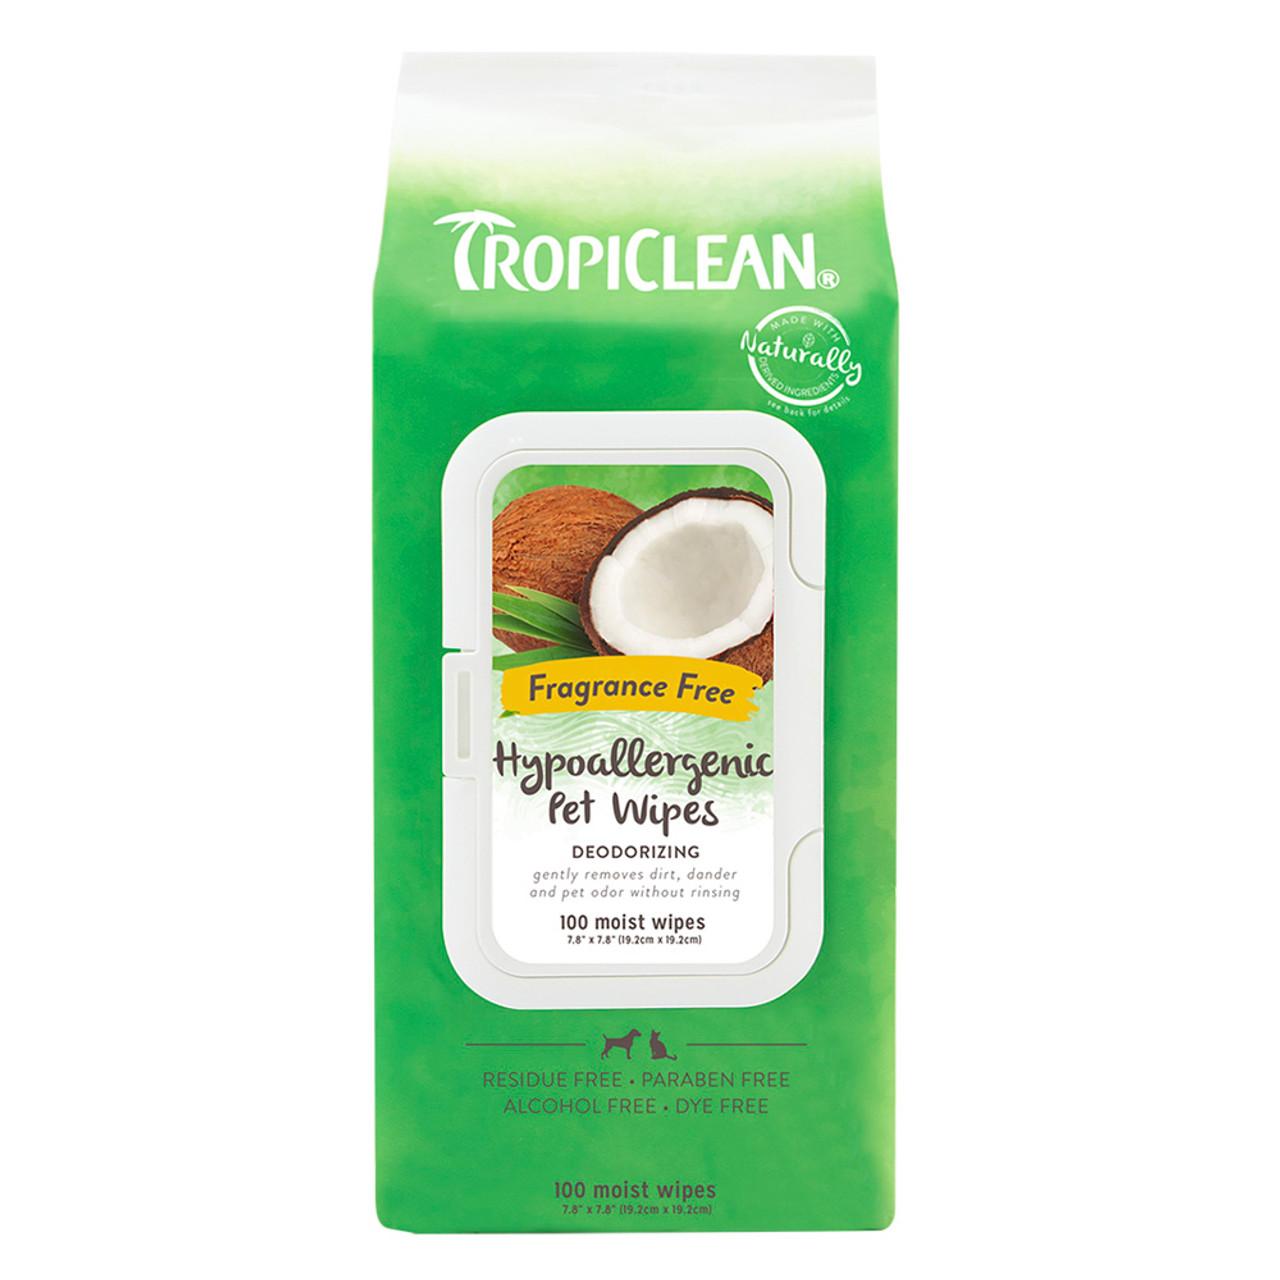 TropiClean Hypoallergenic Cat & Dog Wipes